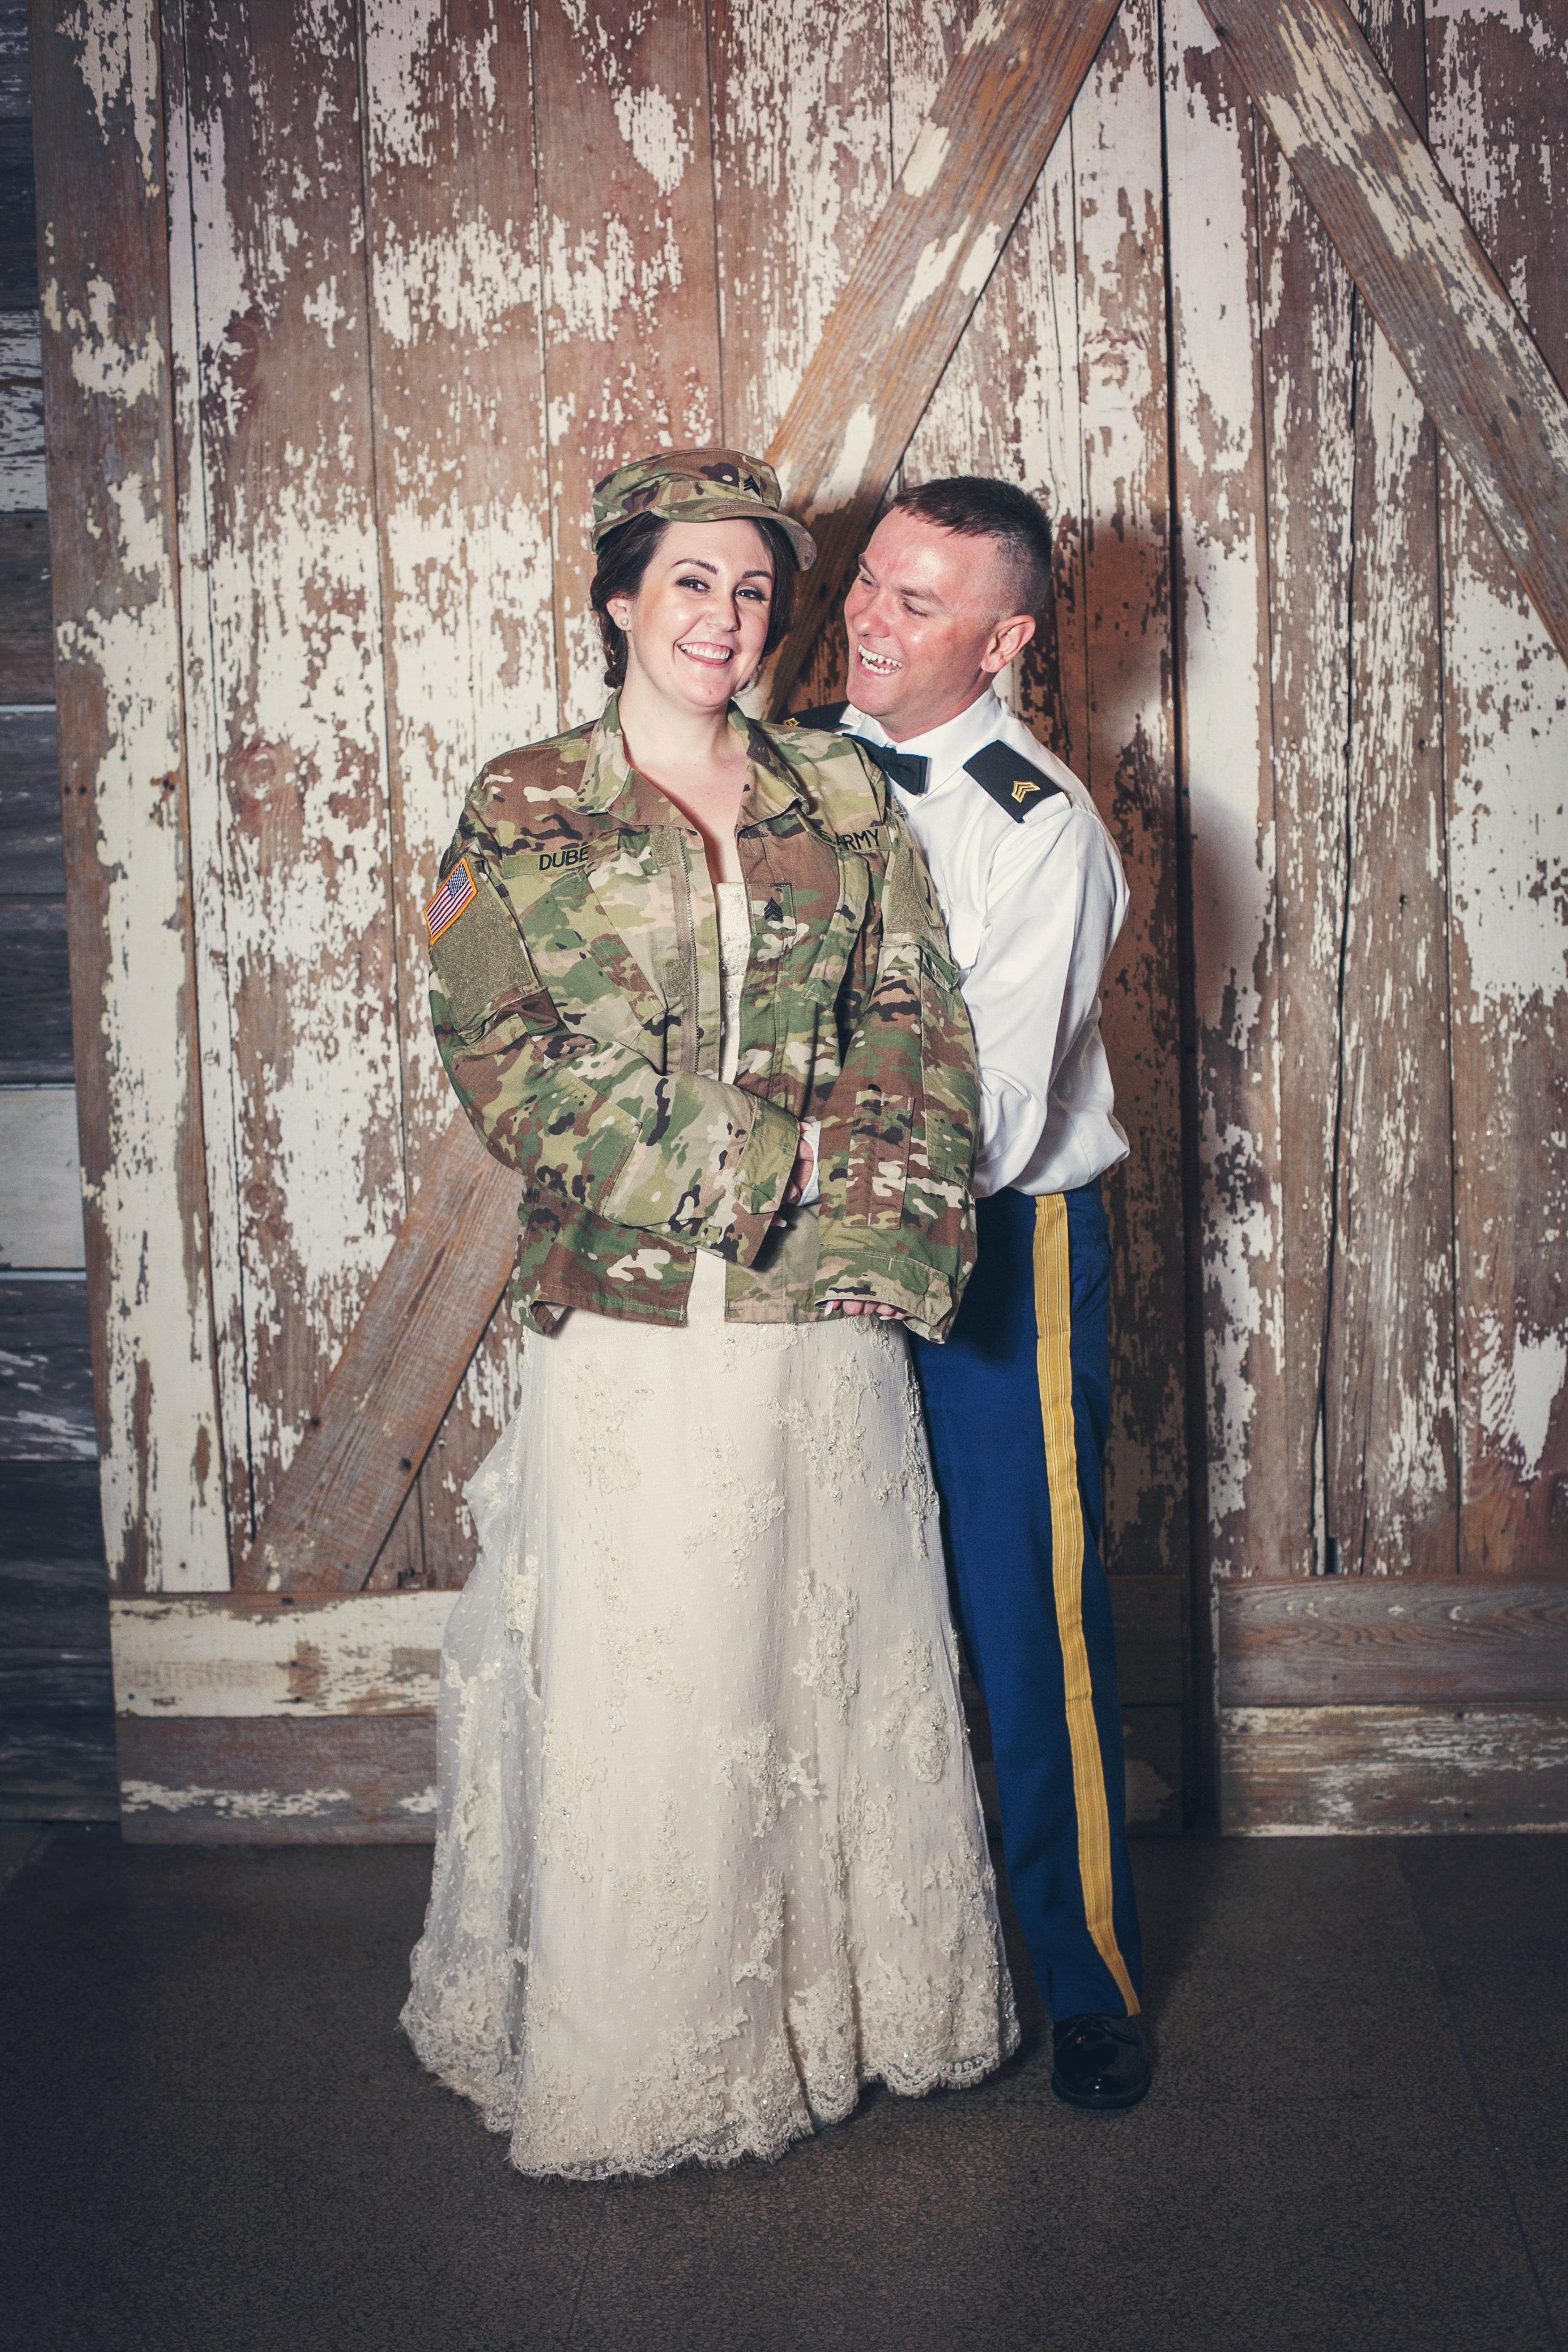 Kansas+City-Small+Wedding_Venue_Elope_Intimate_Ceremony_Memorial+Day_7.jpg